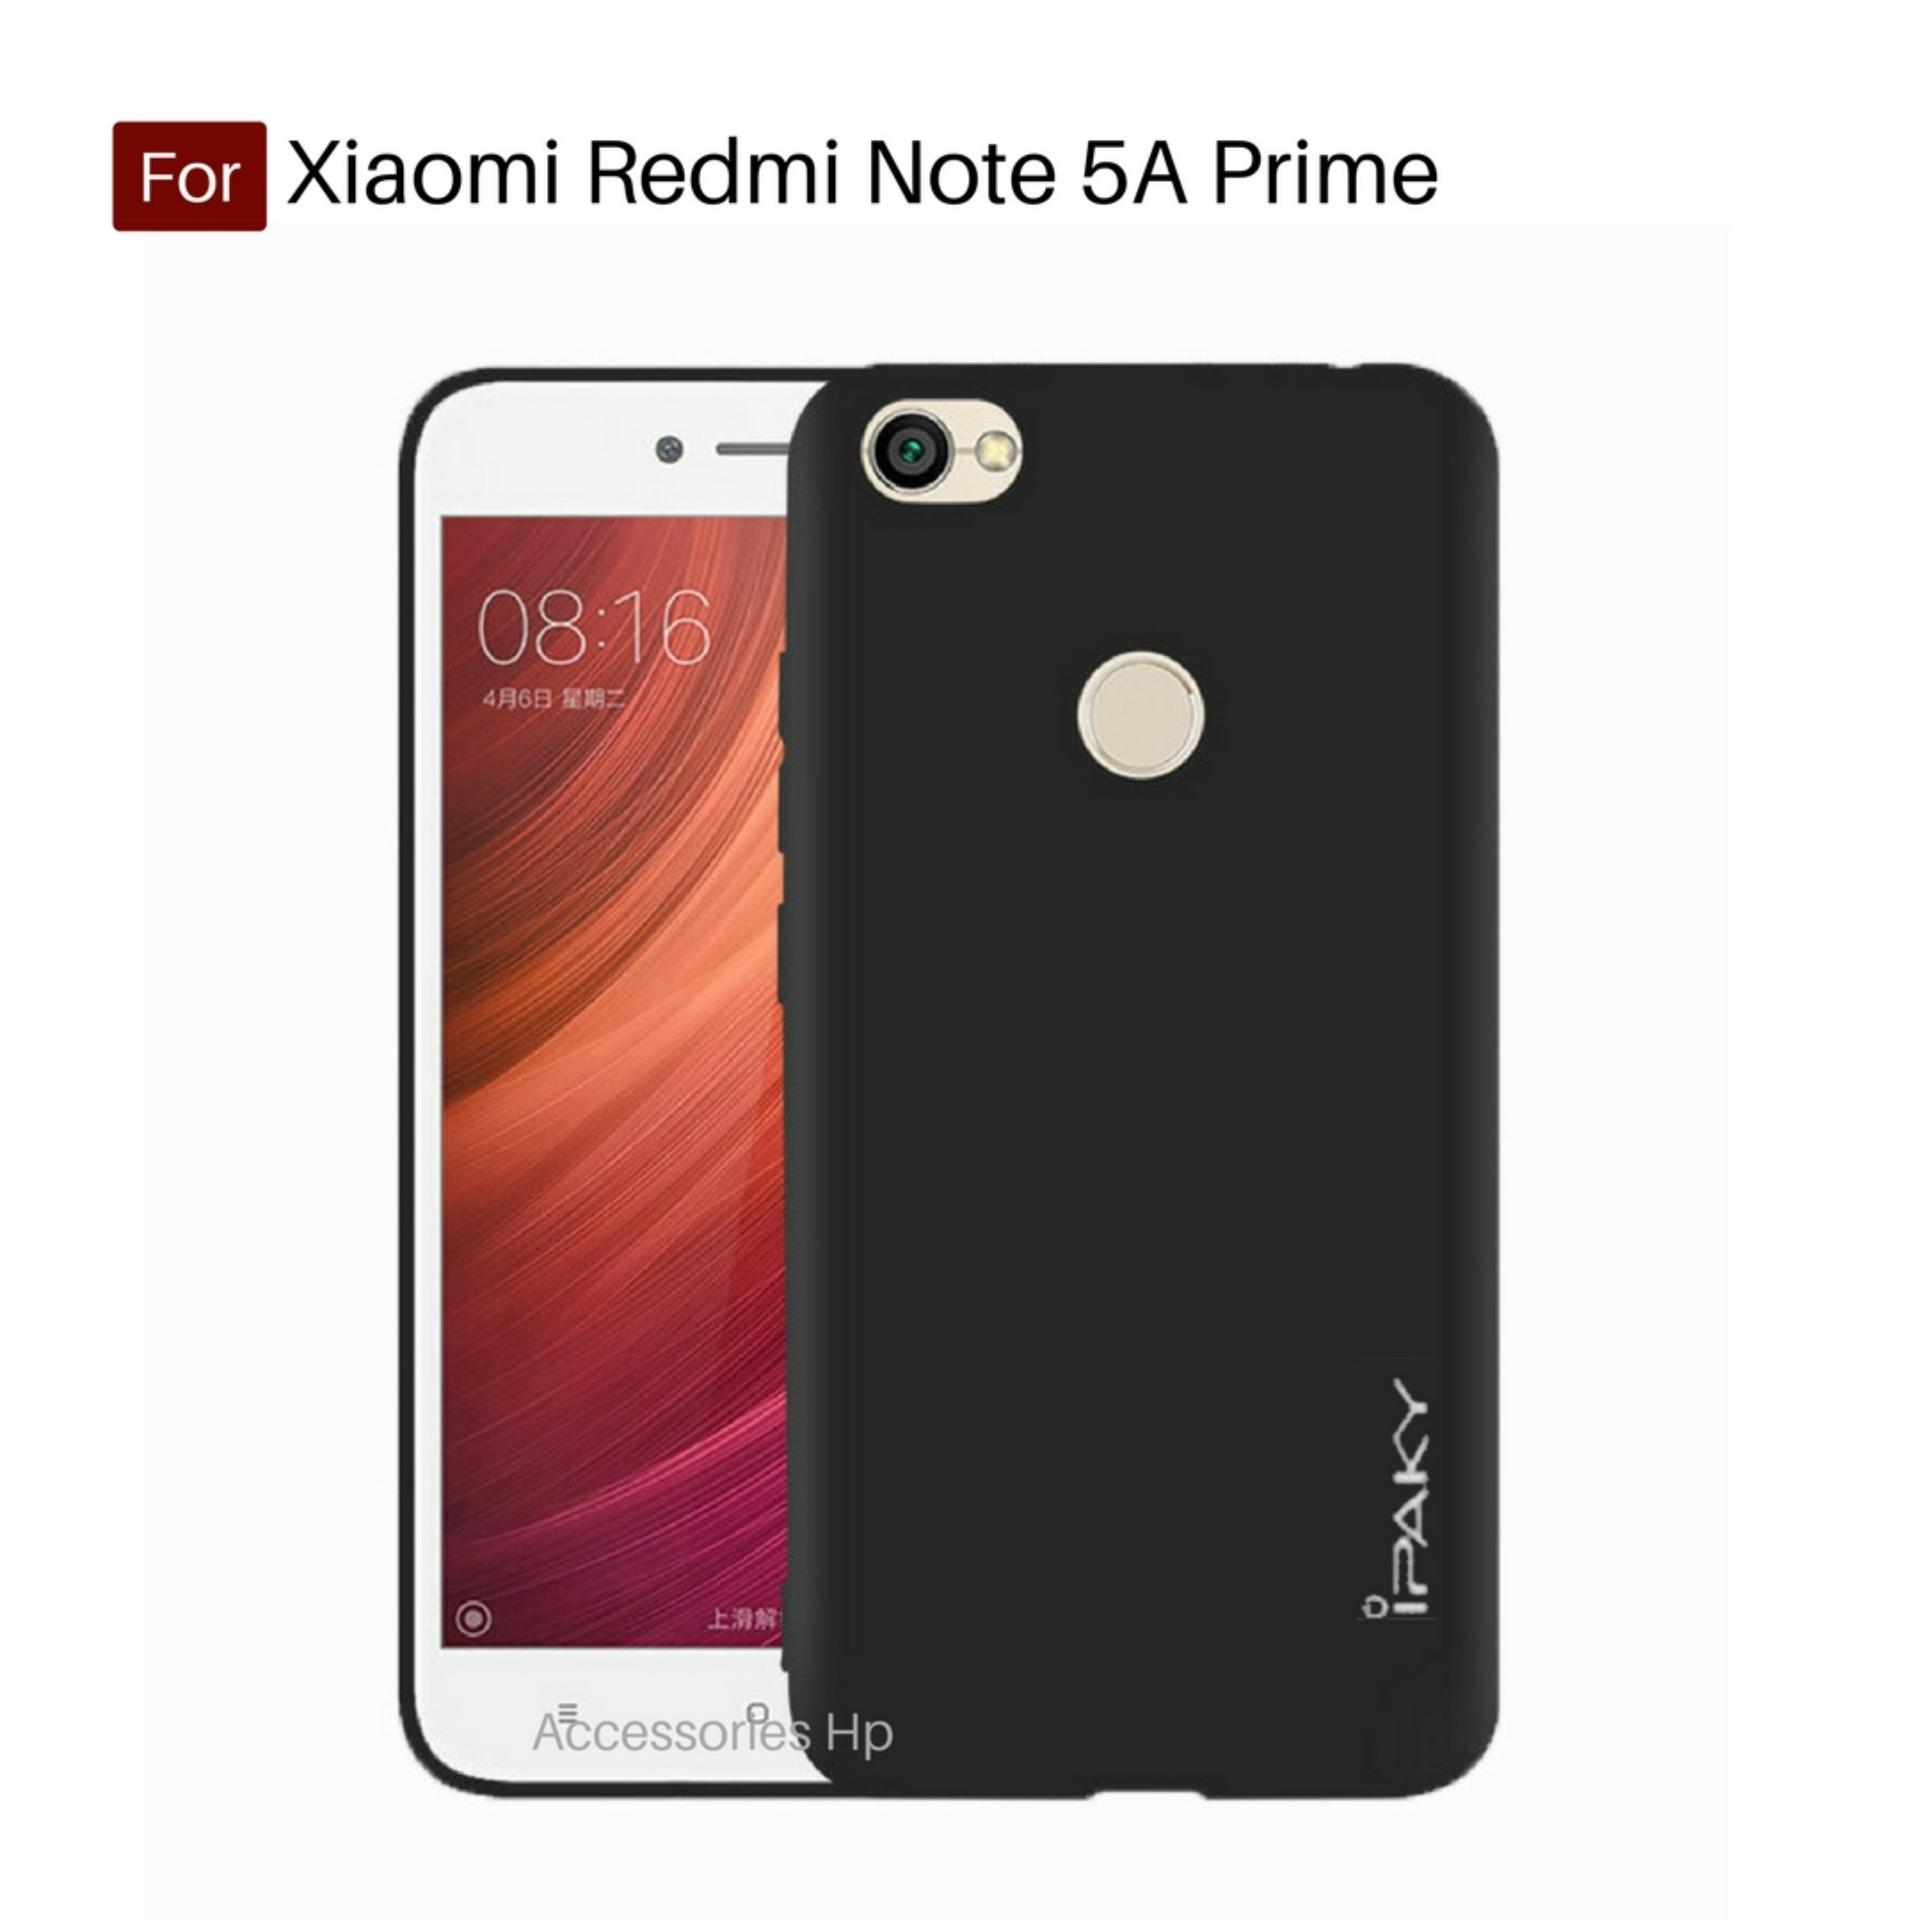 Accessories Hp iPaky Super Slim Matte Anti Fingerprint Hybrid Case For Xiaomi Redmi Note 5A Prime - Black